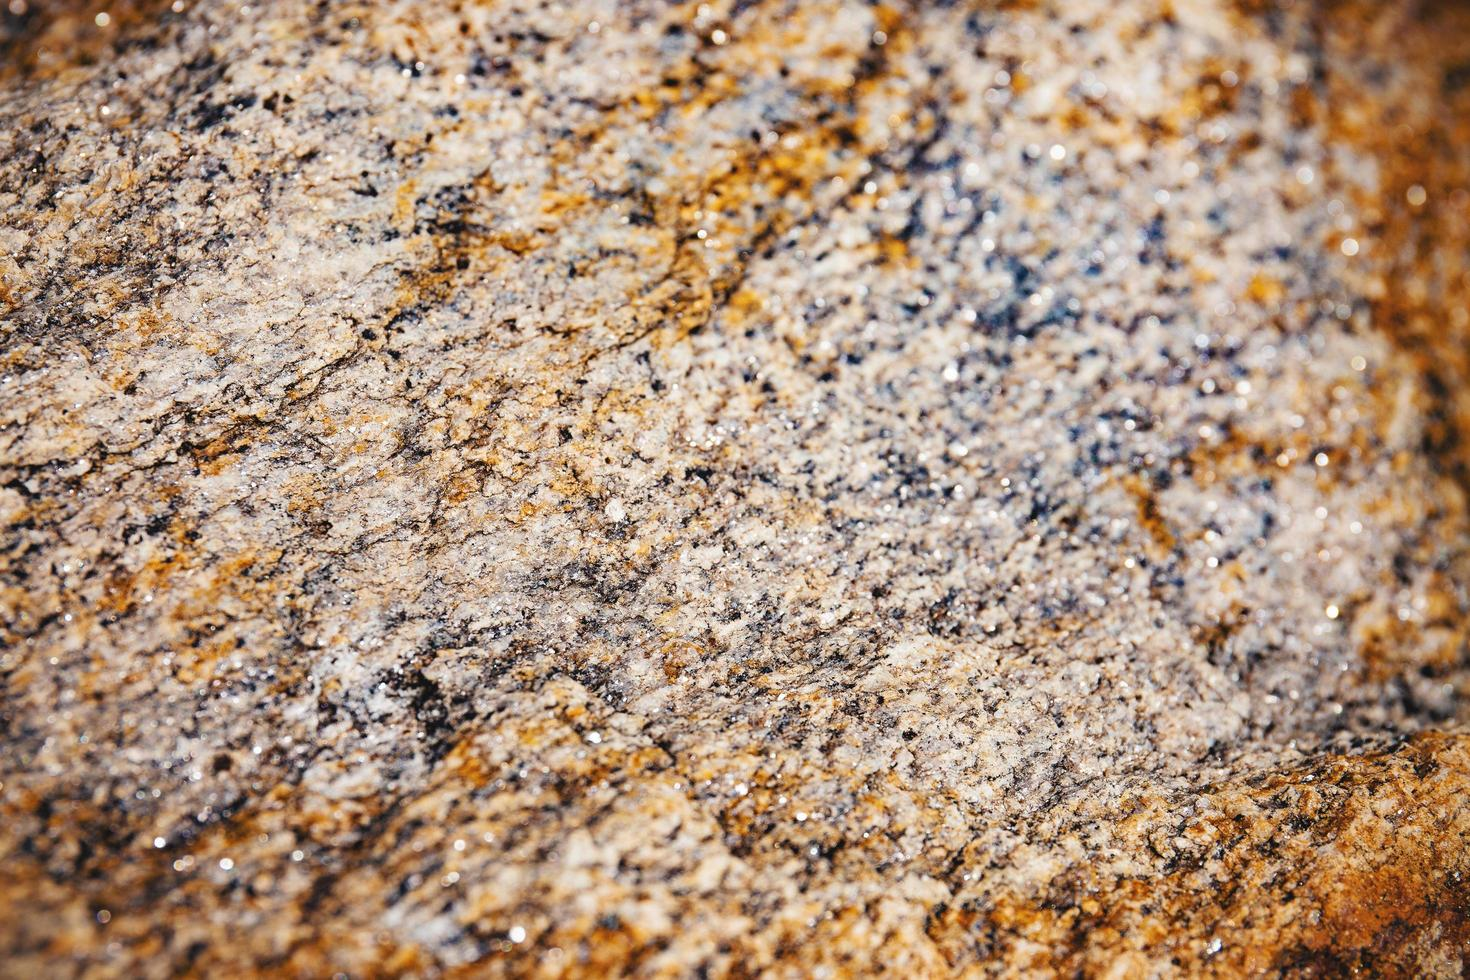 geselecteerde focus van roestig en stoffig van ruwe stenen oppervlaktetextuur. foto